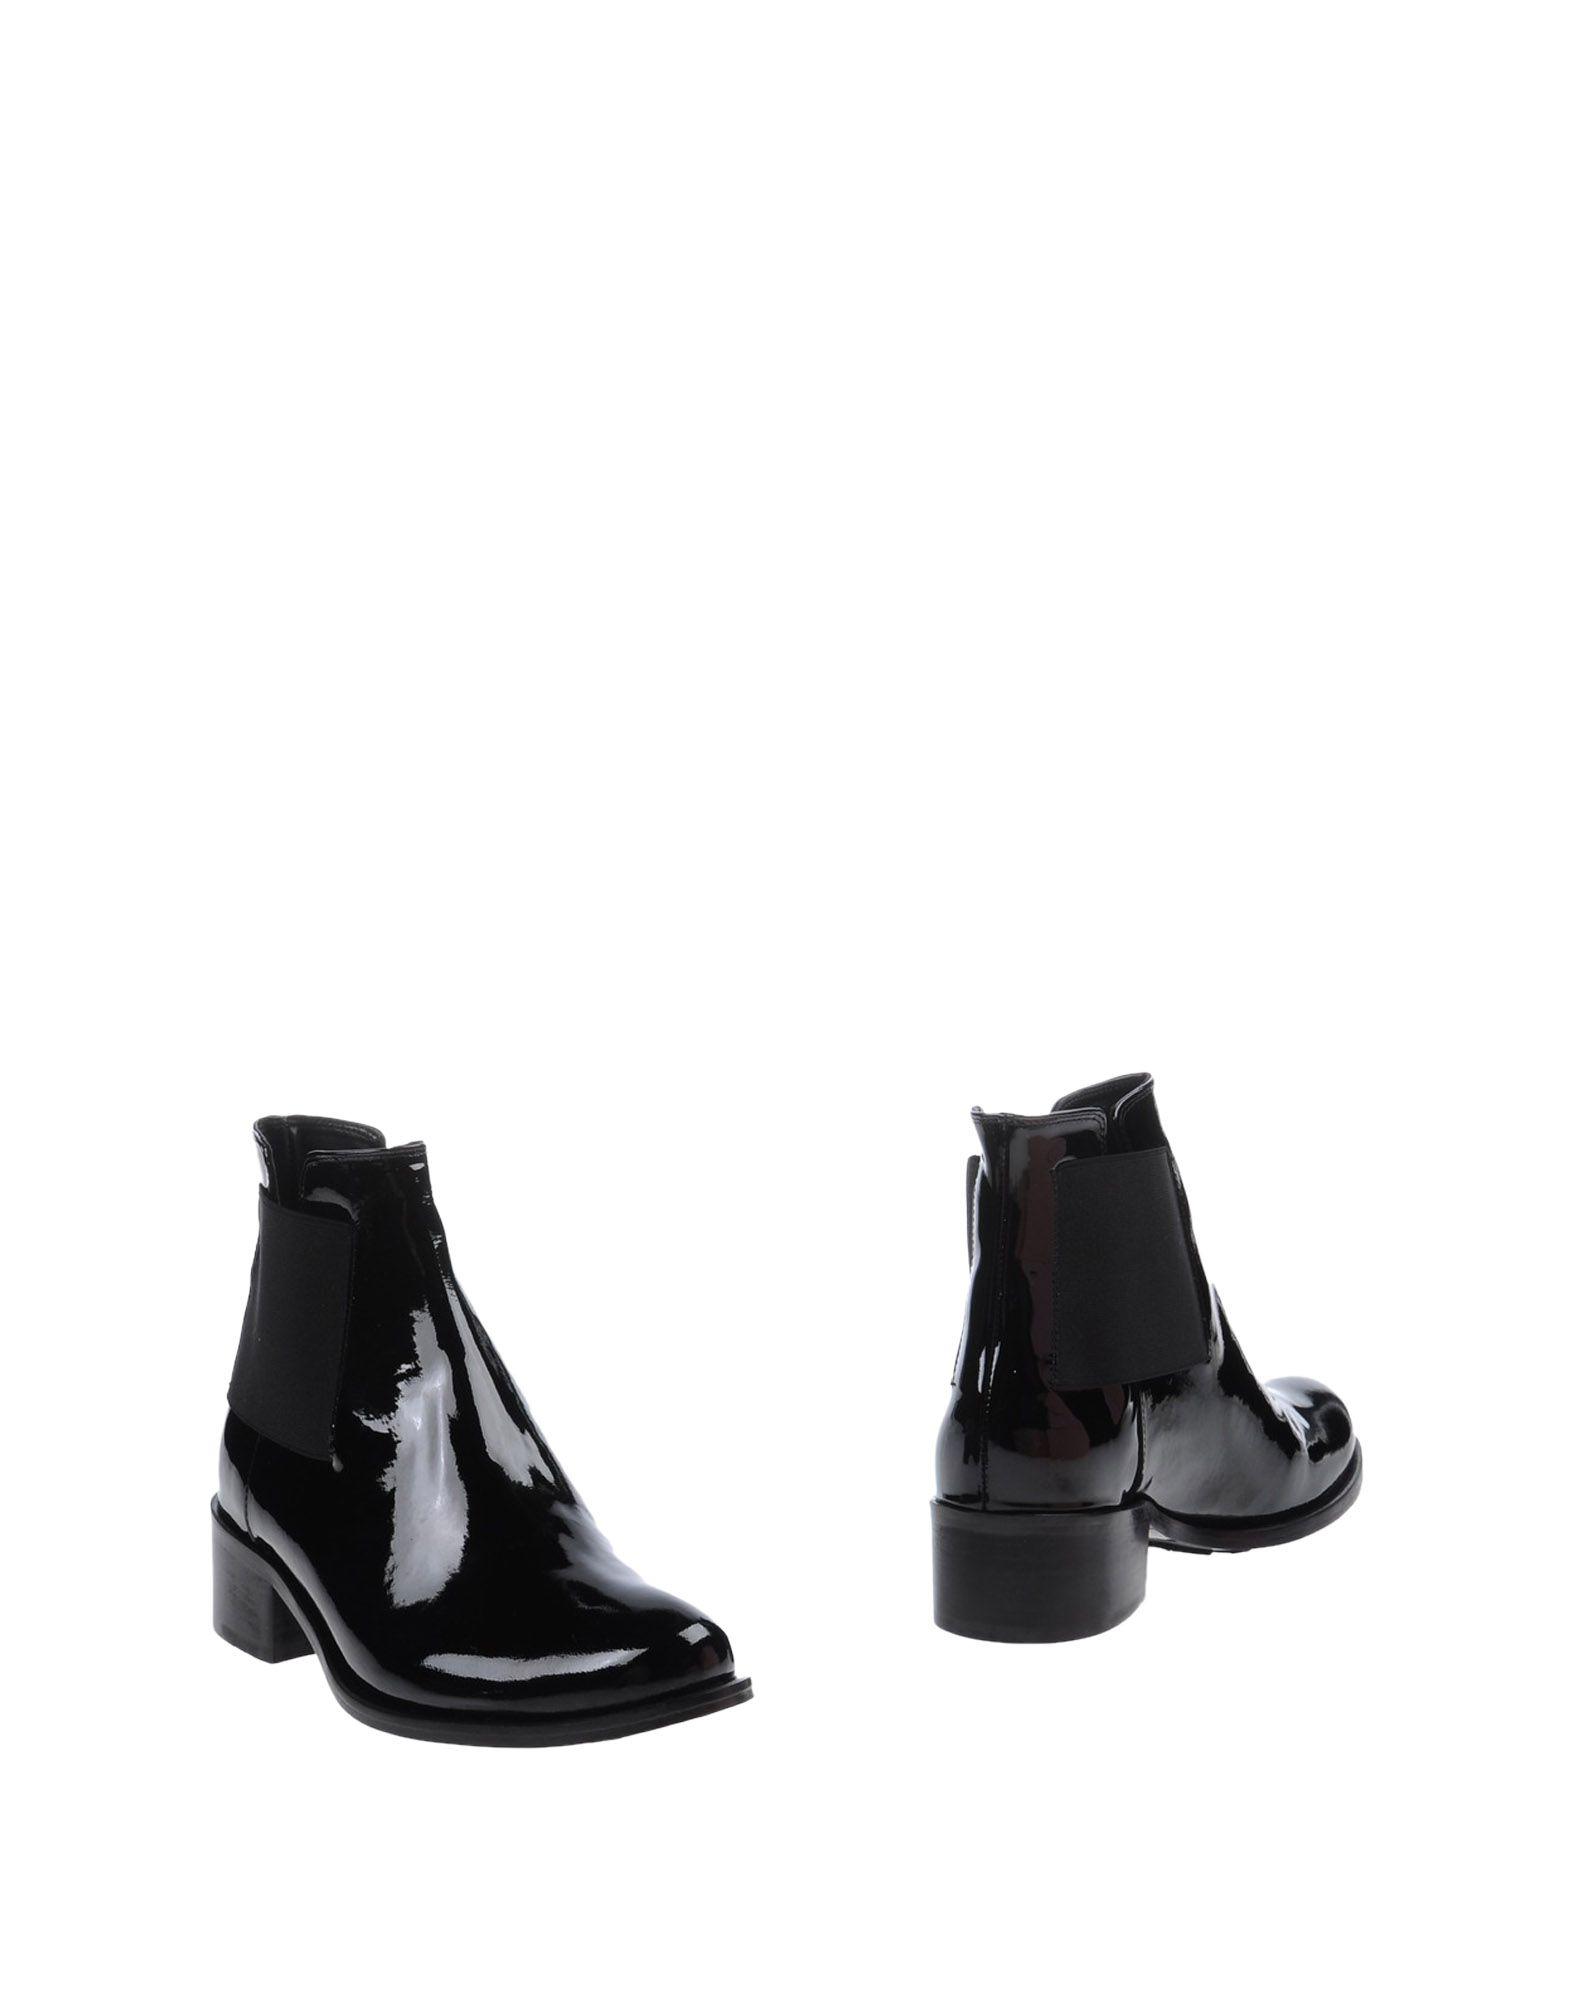 Rêve D'un Jour Chelsea Boots Damen  11049460PB Gute Qualität beliebte Schuhe